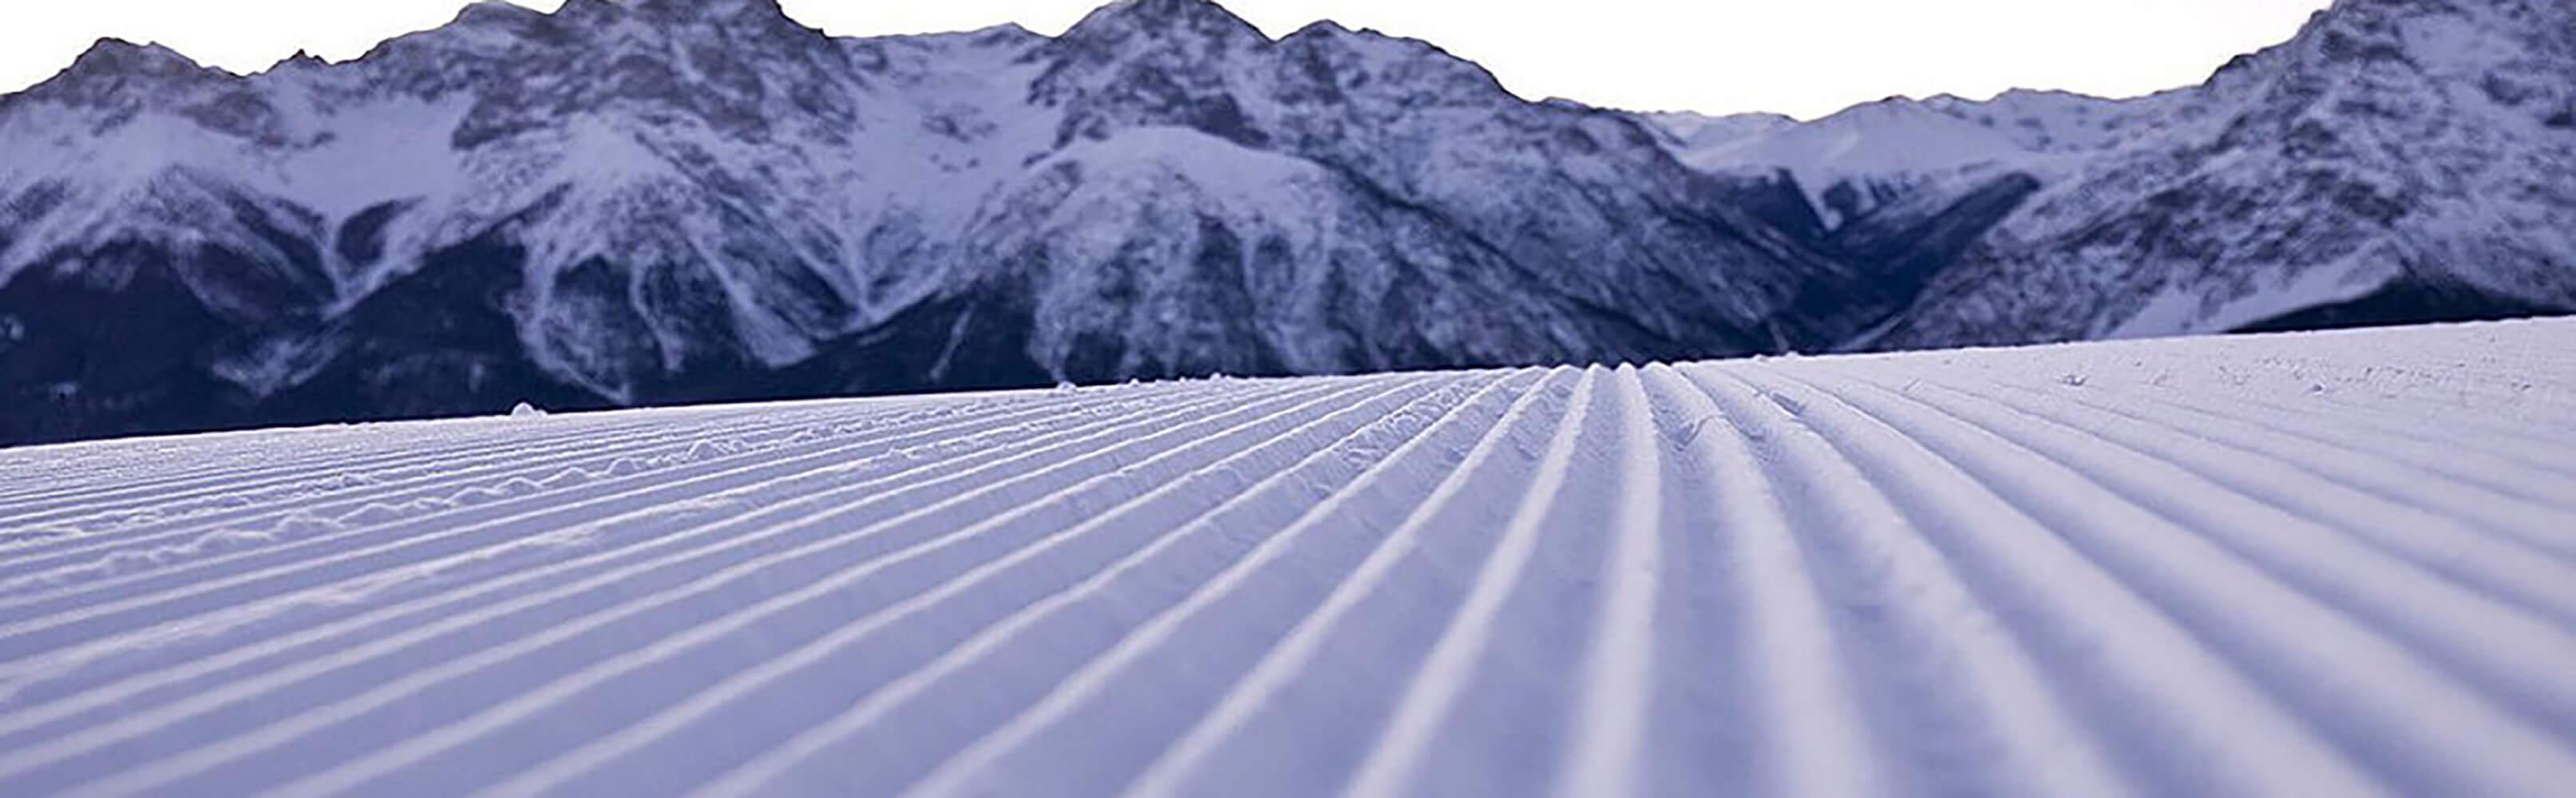 Skigebiet Scuol - Motta Naluns 1